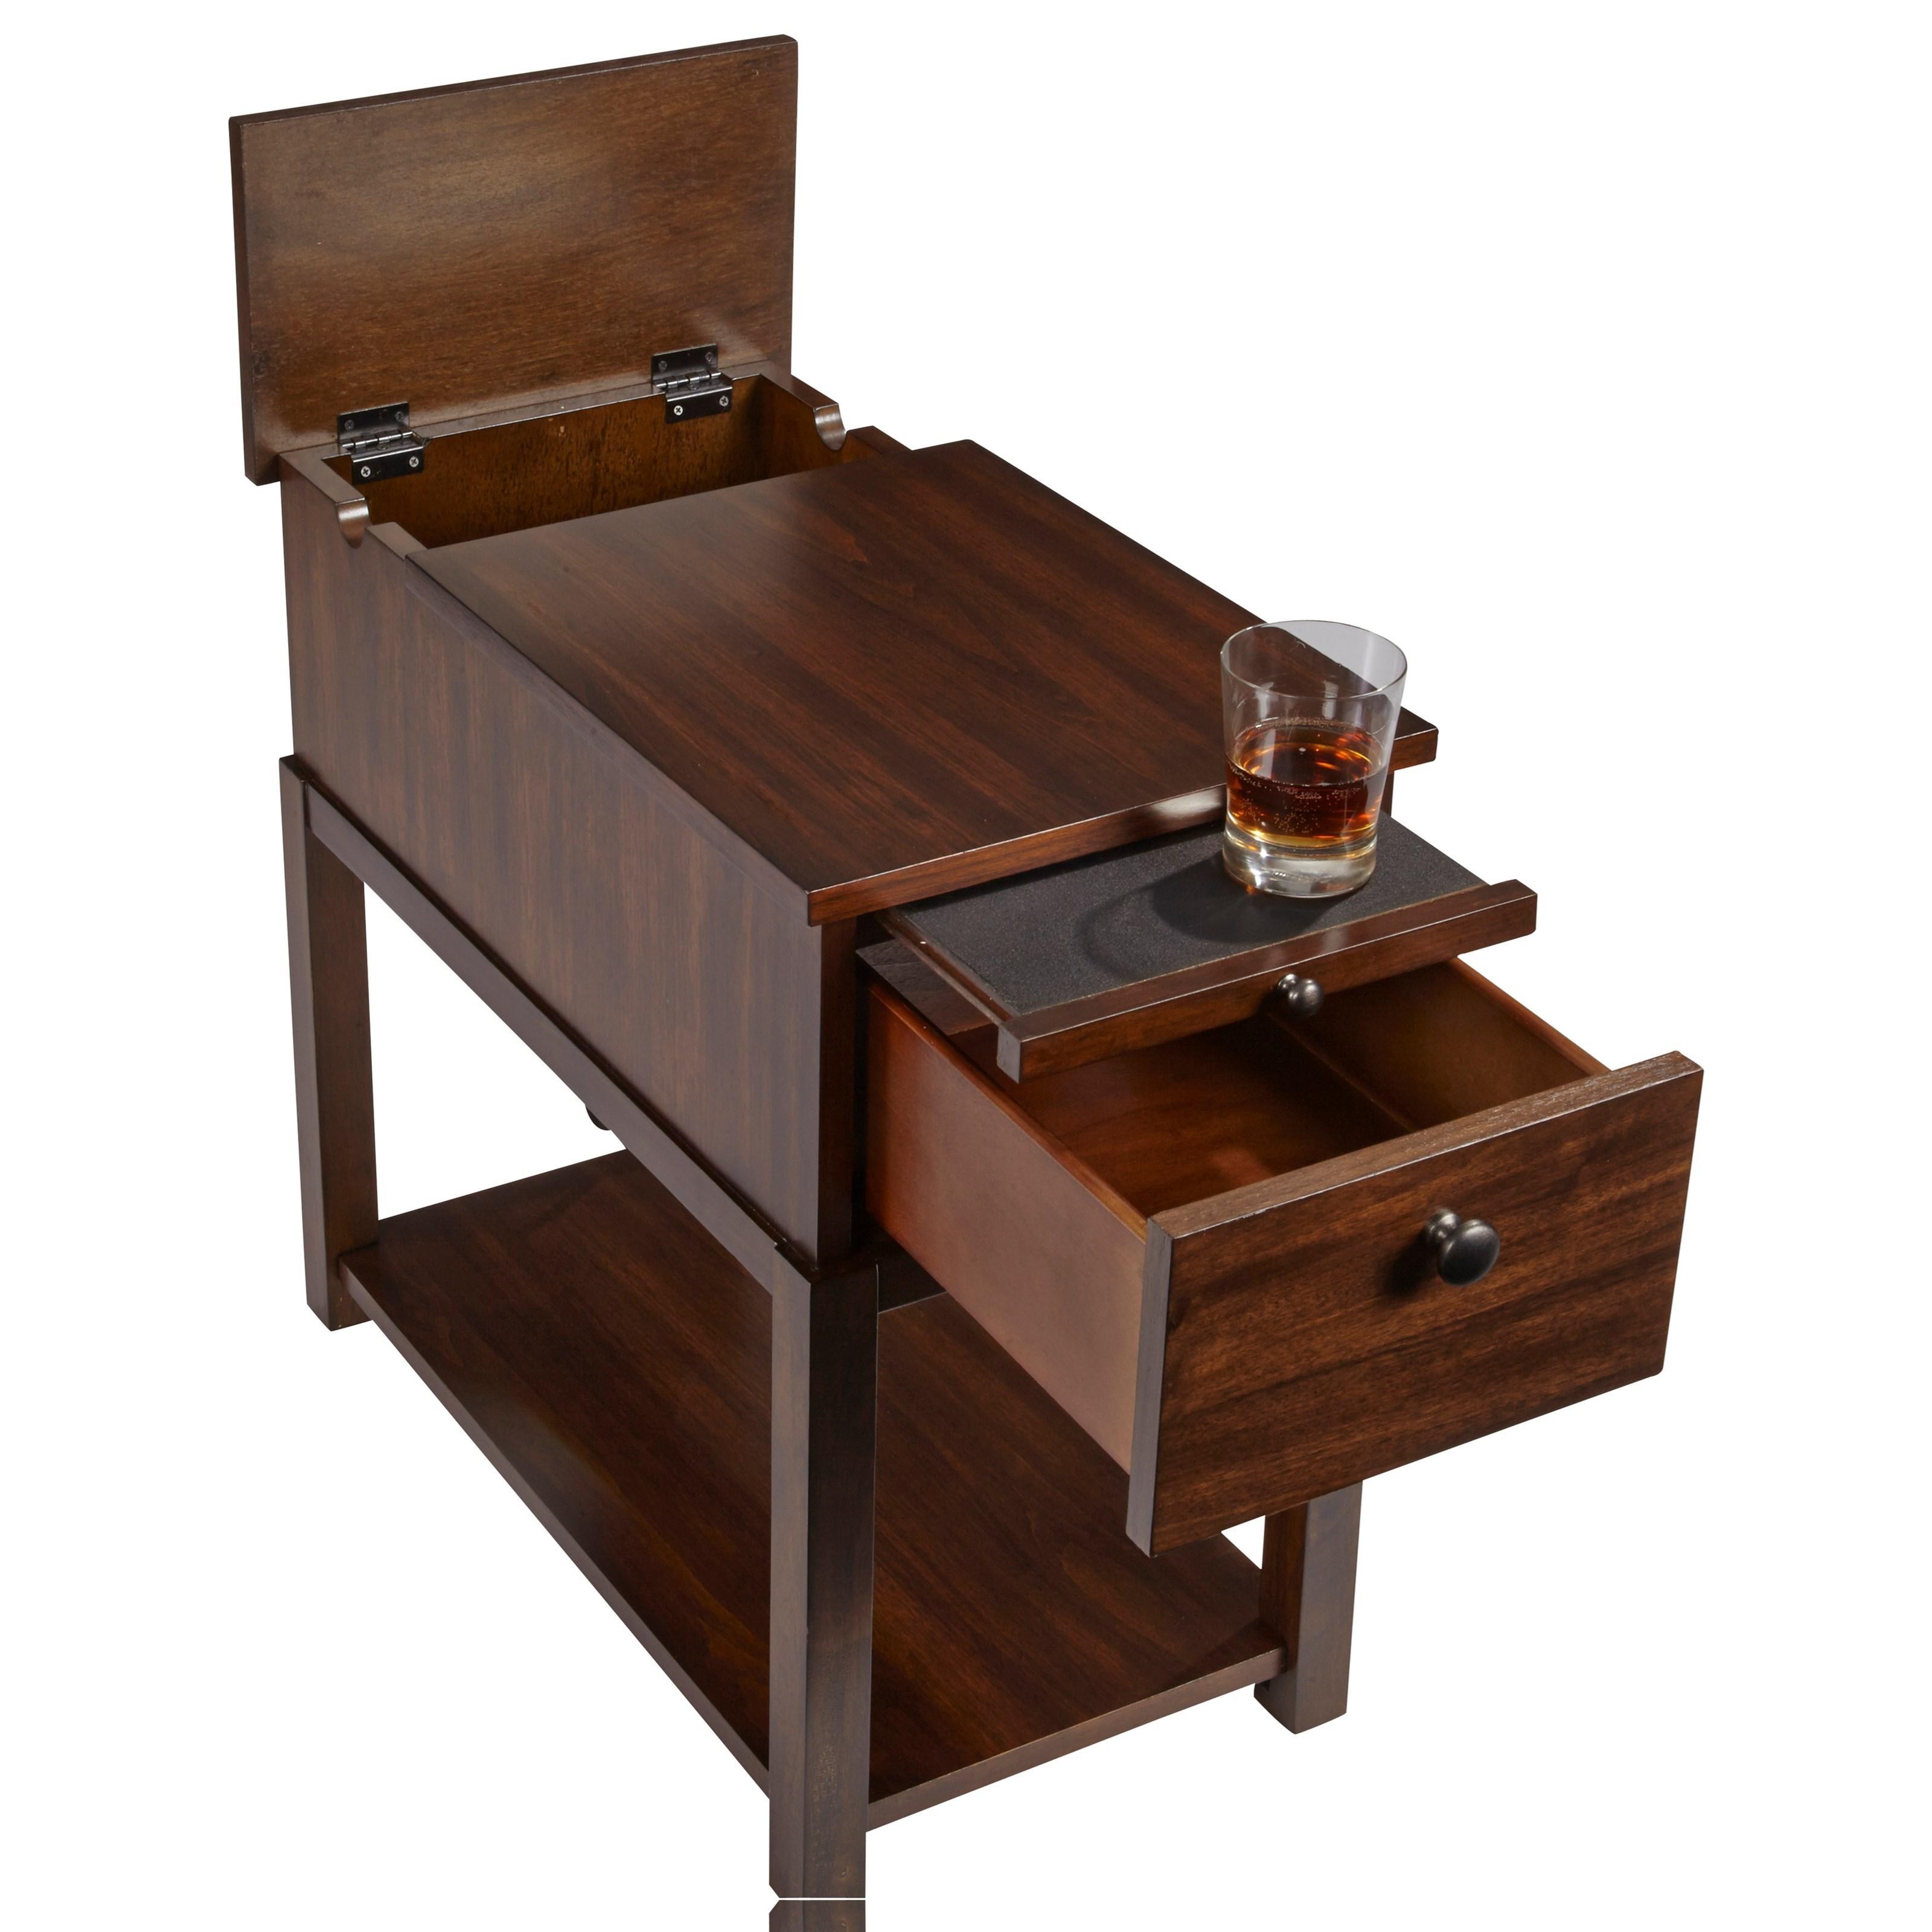 Superieur Progressive Furniture Chairsides IIChairside Table; Progressive Furniture  Chairsides IIChairside Table ...